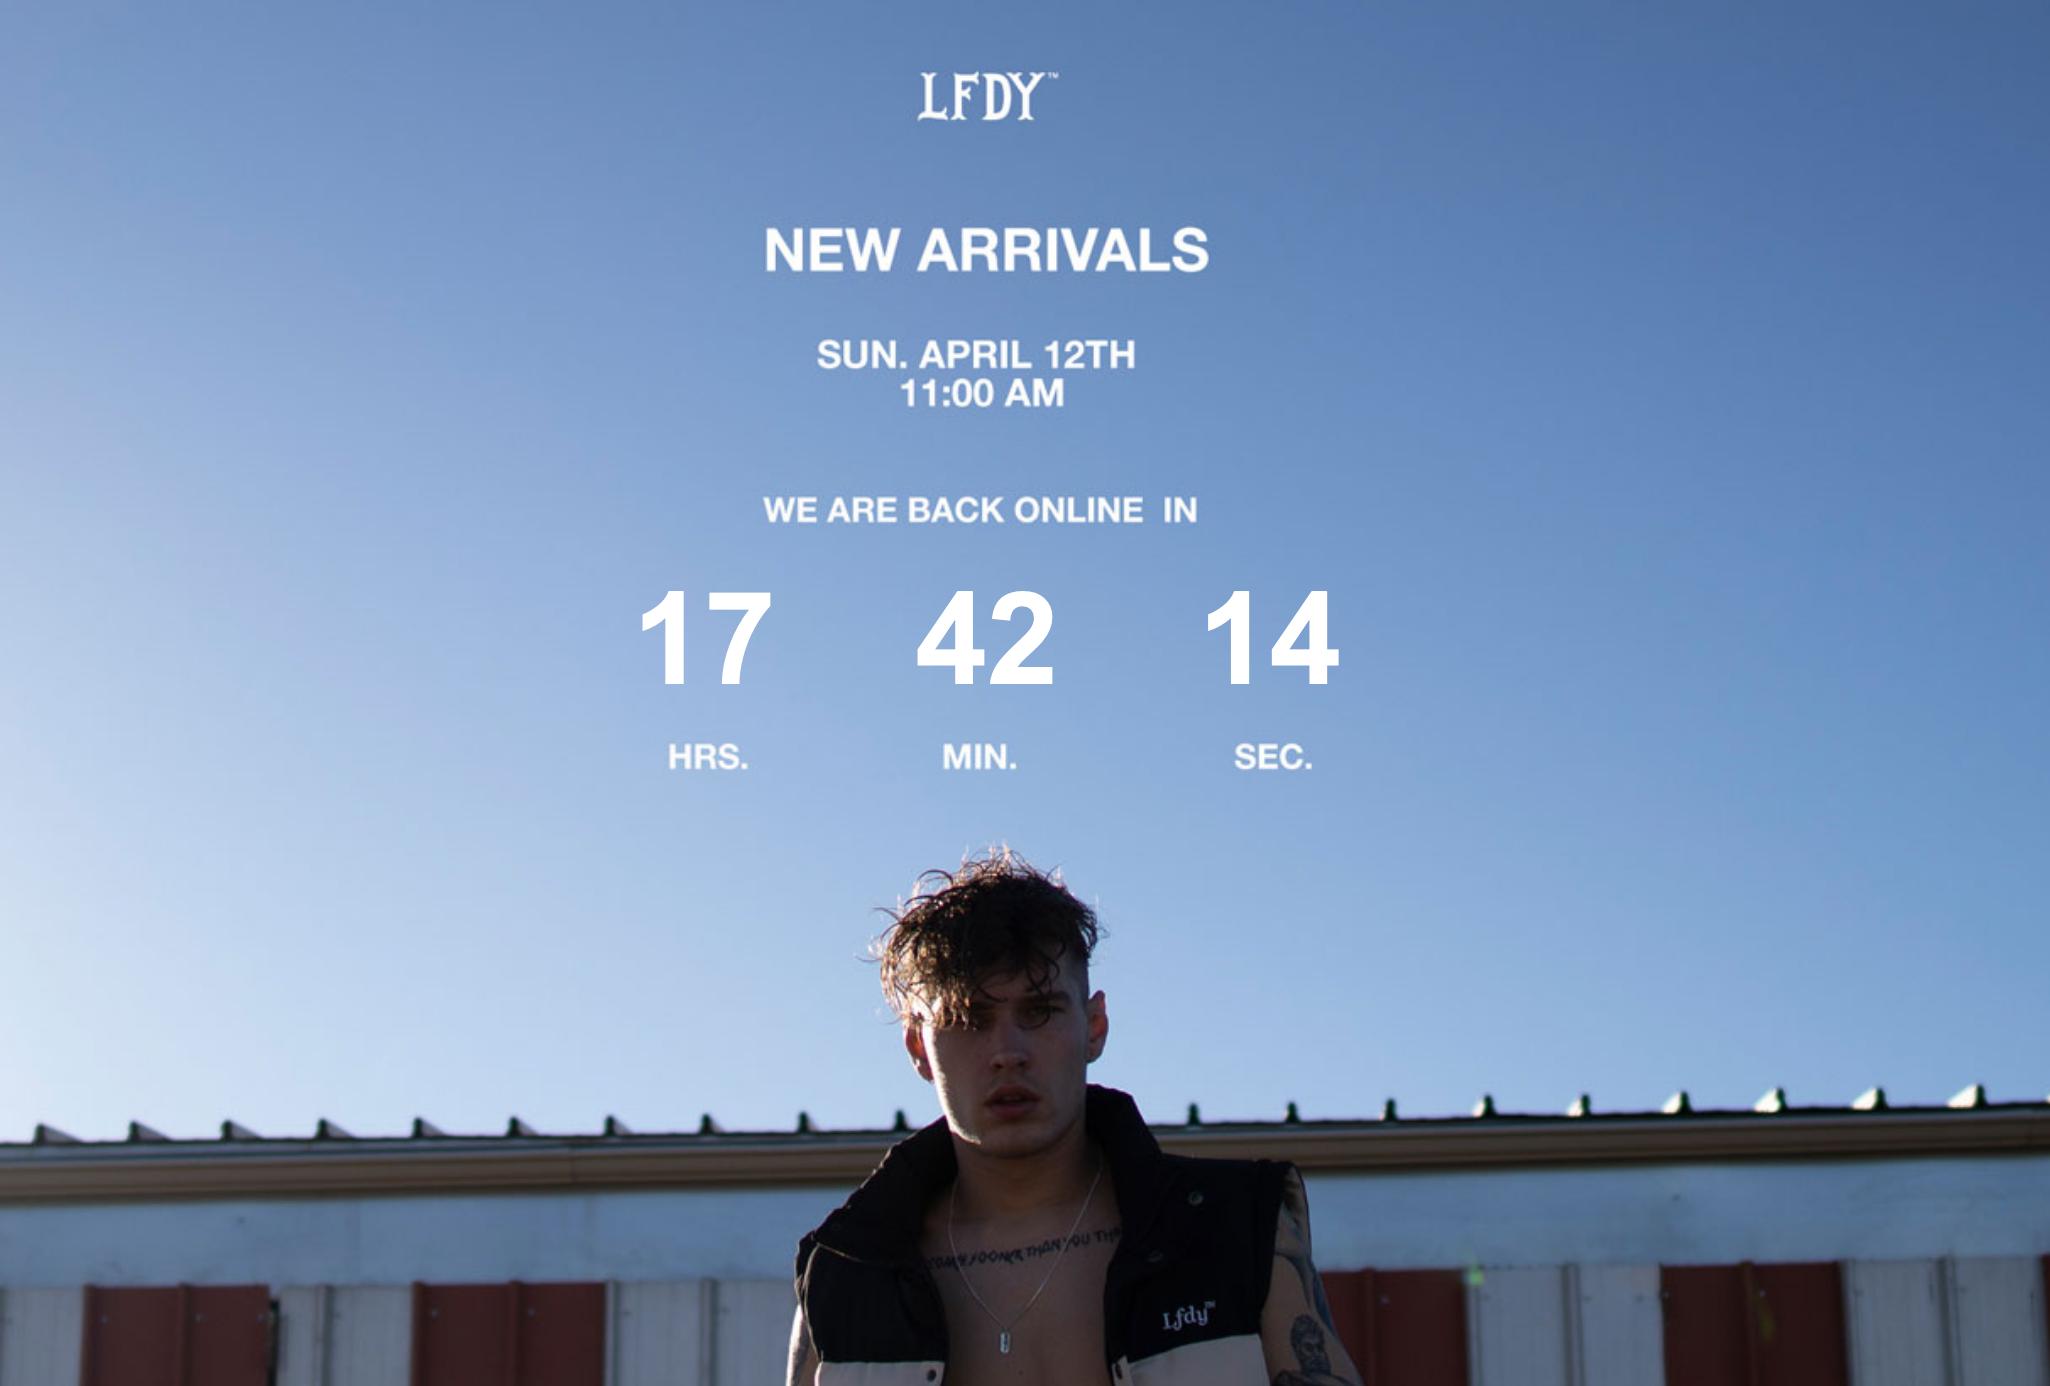 Live Fast die Young LFDY Restock Online-Shop Update